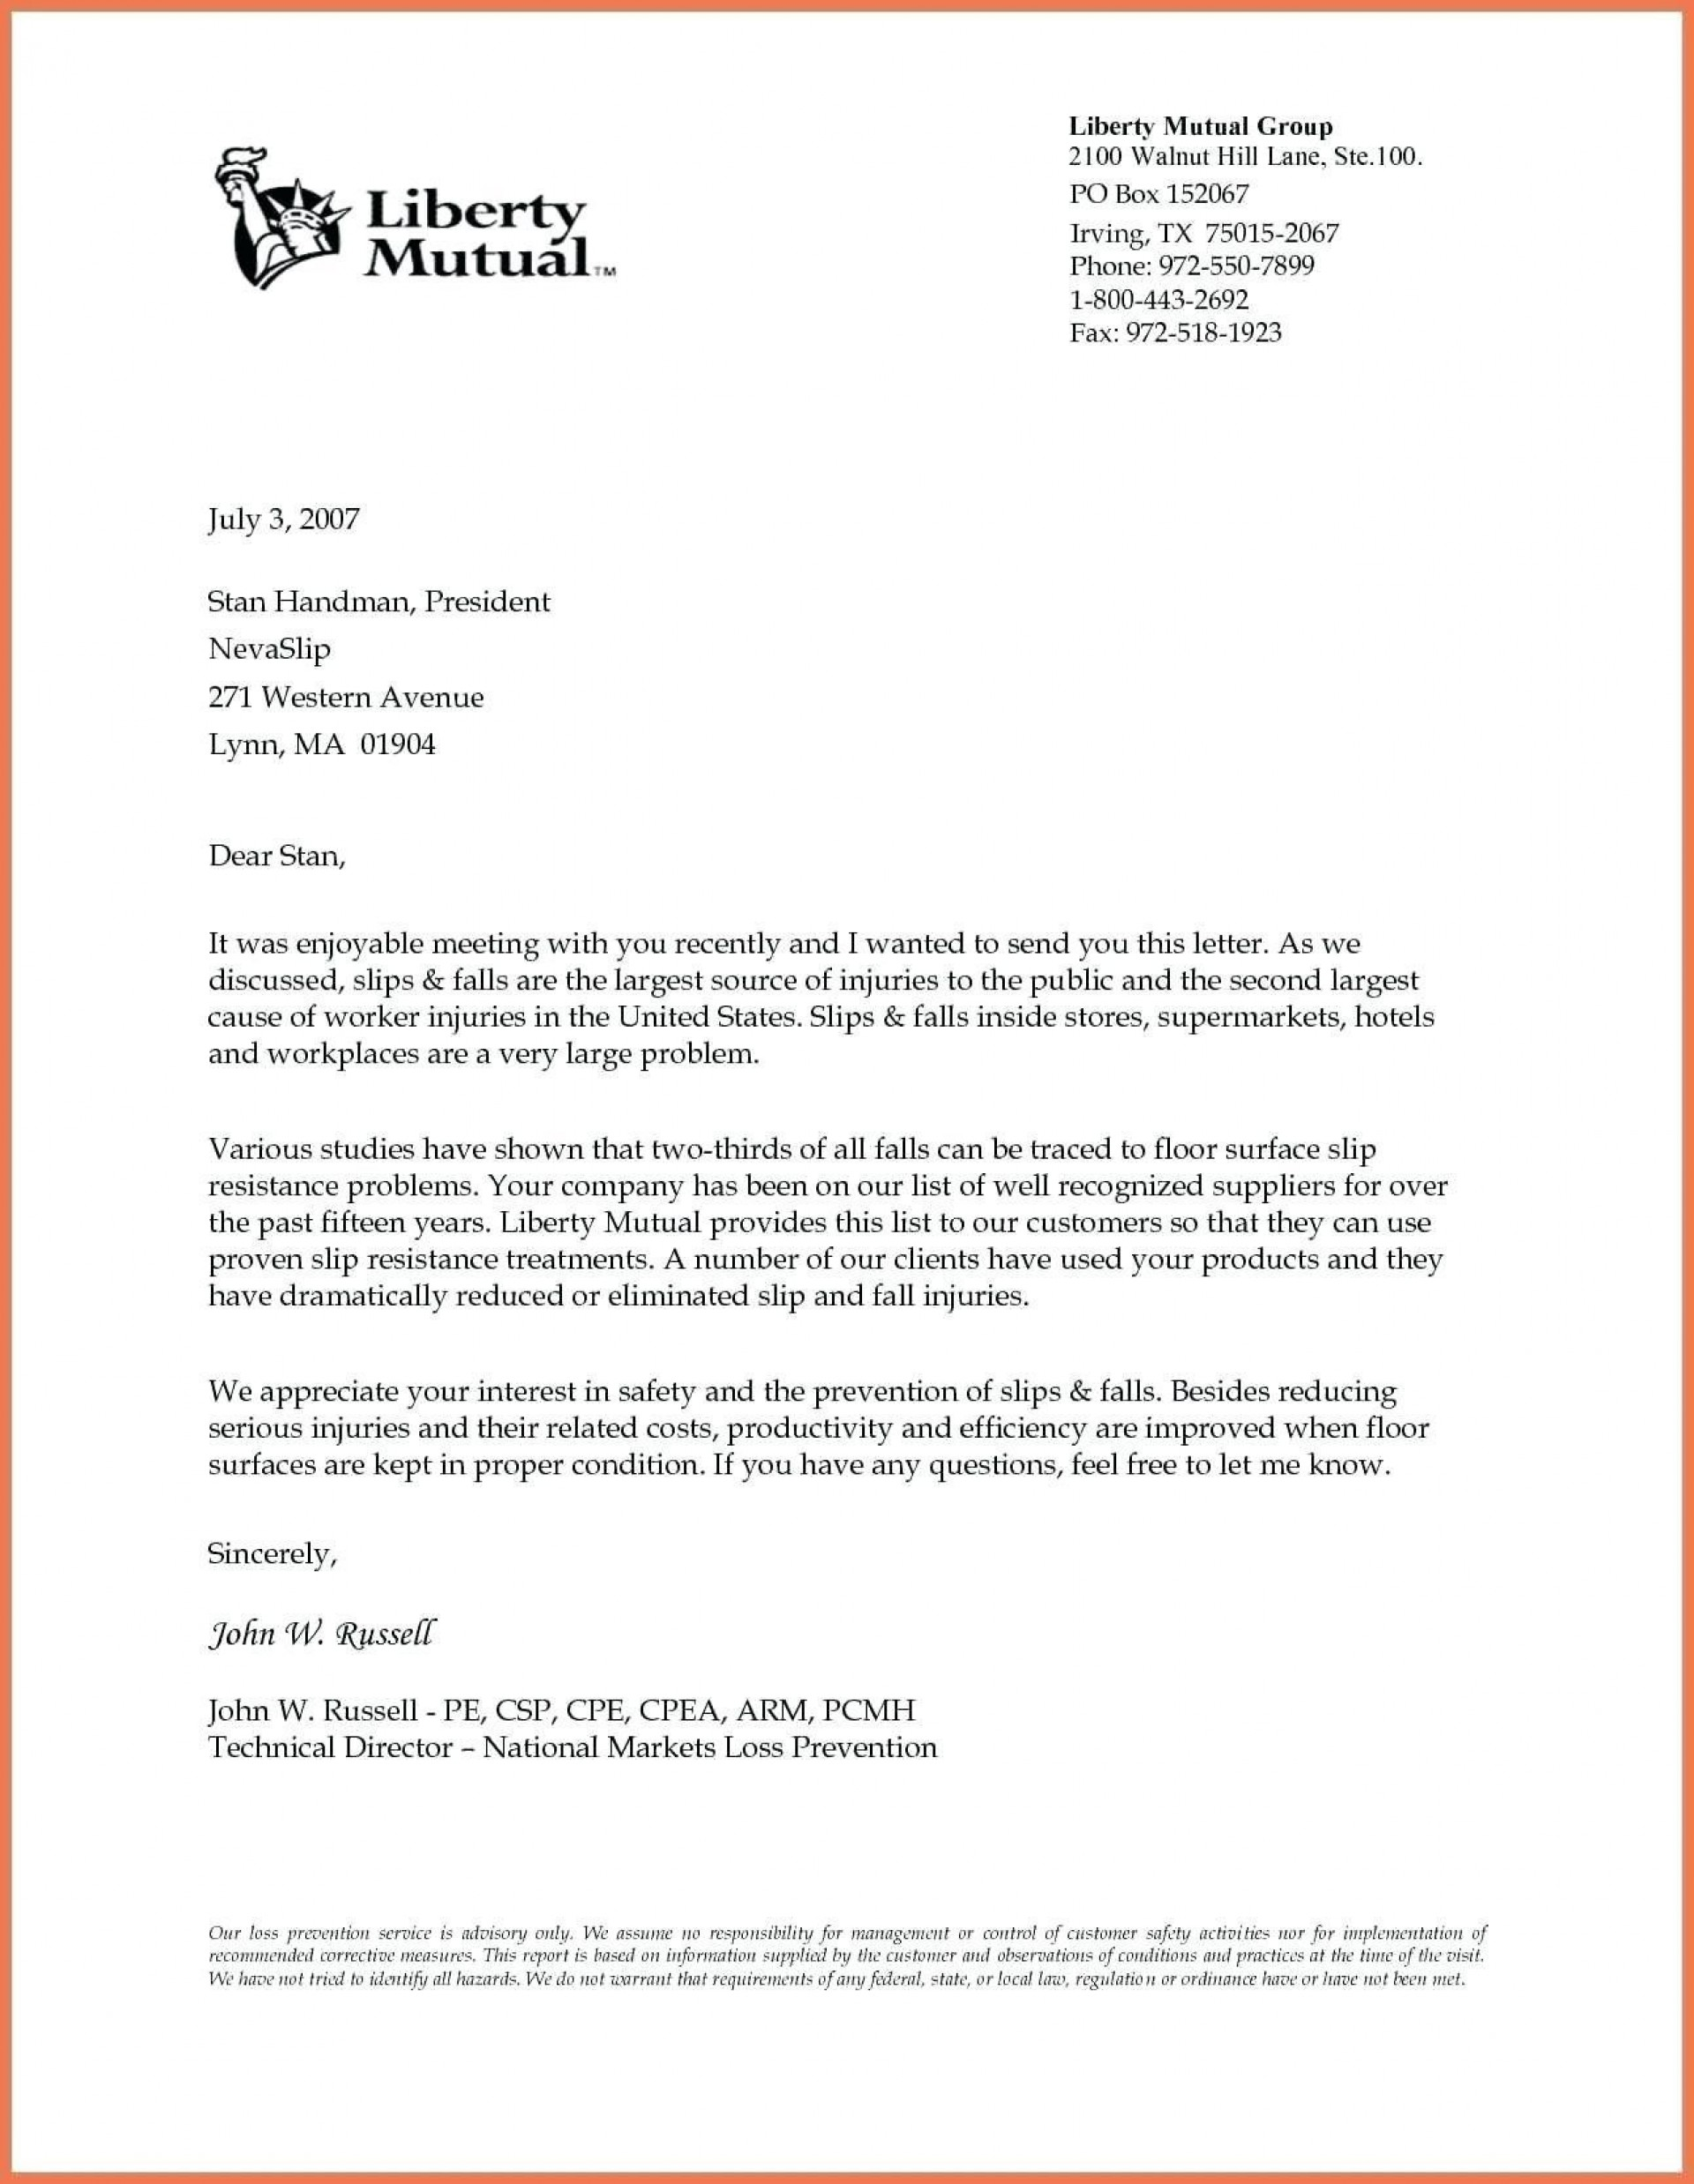 007 Unforgettable Formal Busines Letter Template High Definition  Pdf Australia Format1920